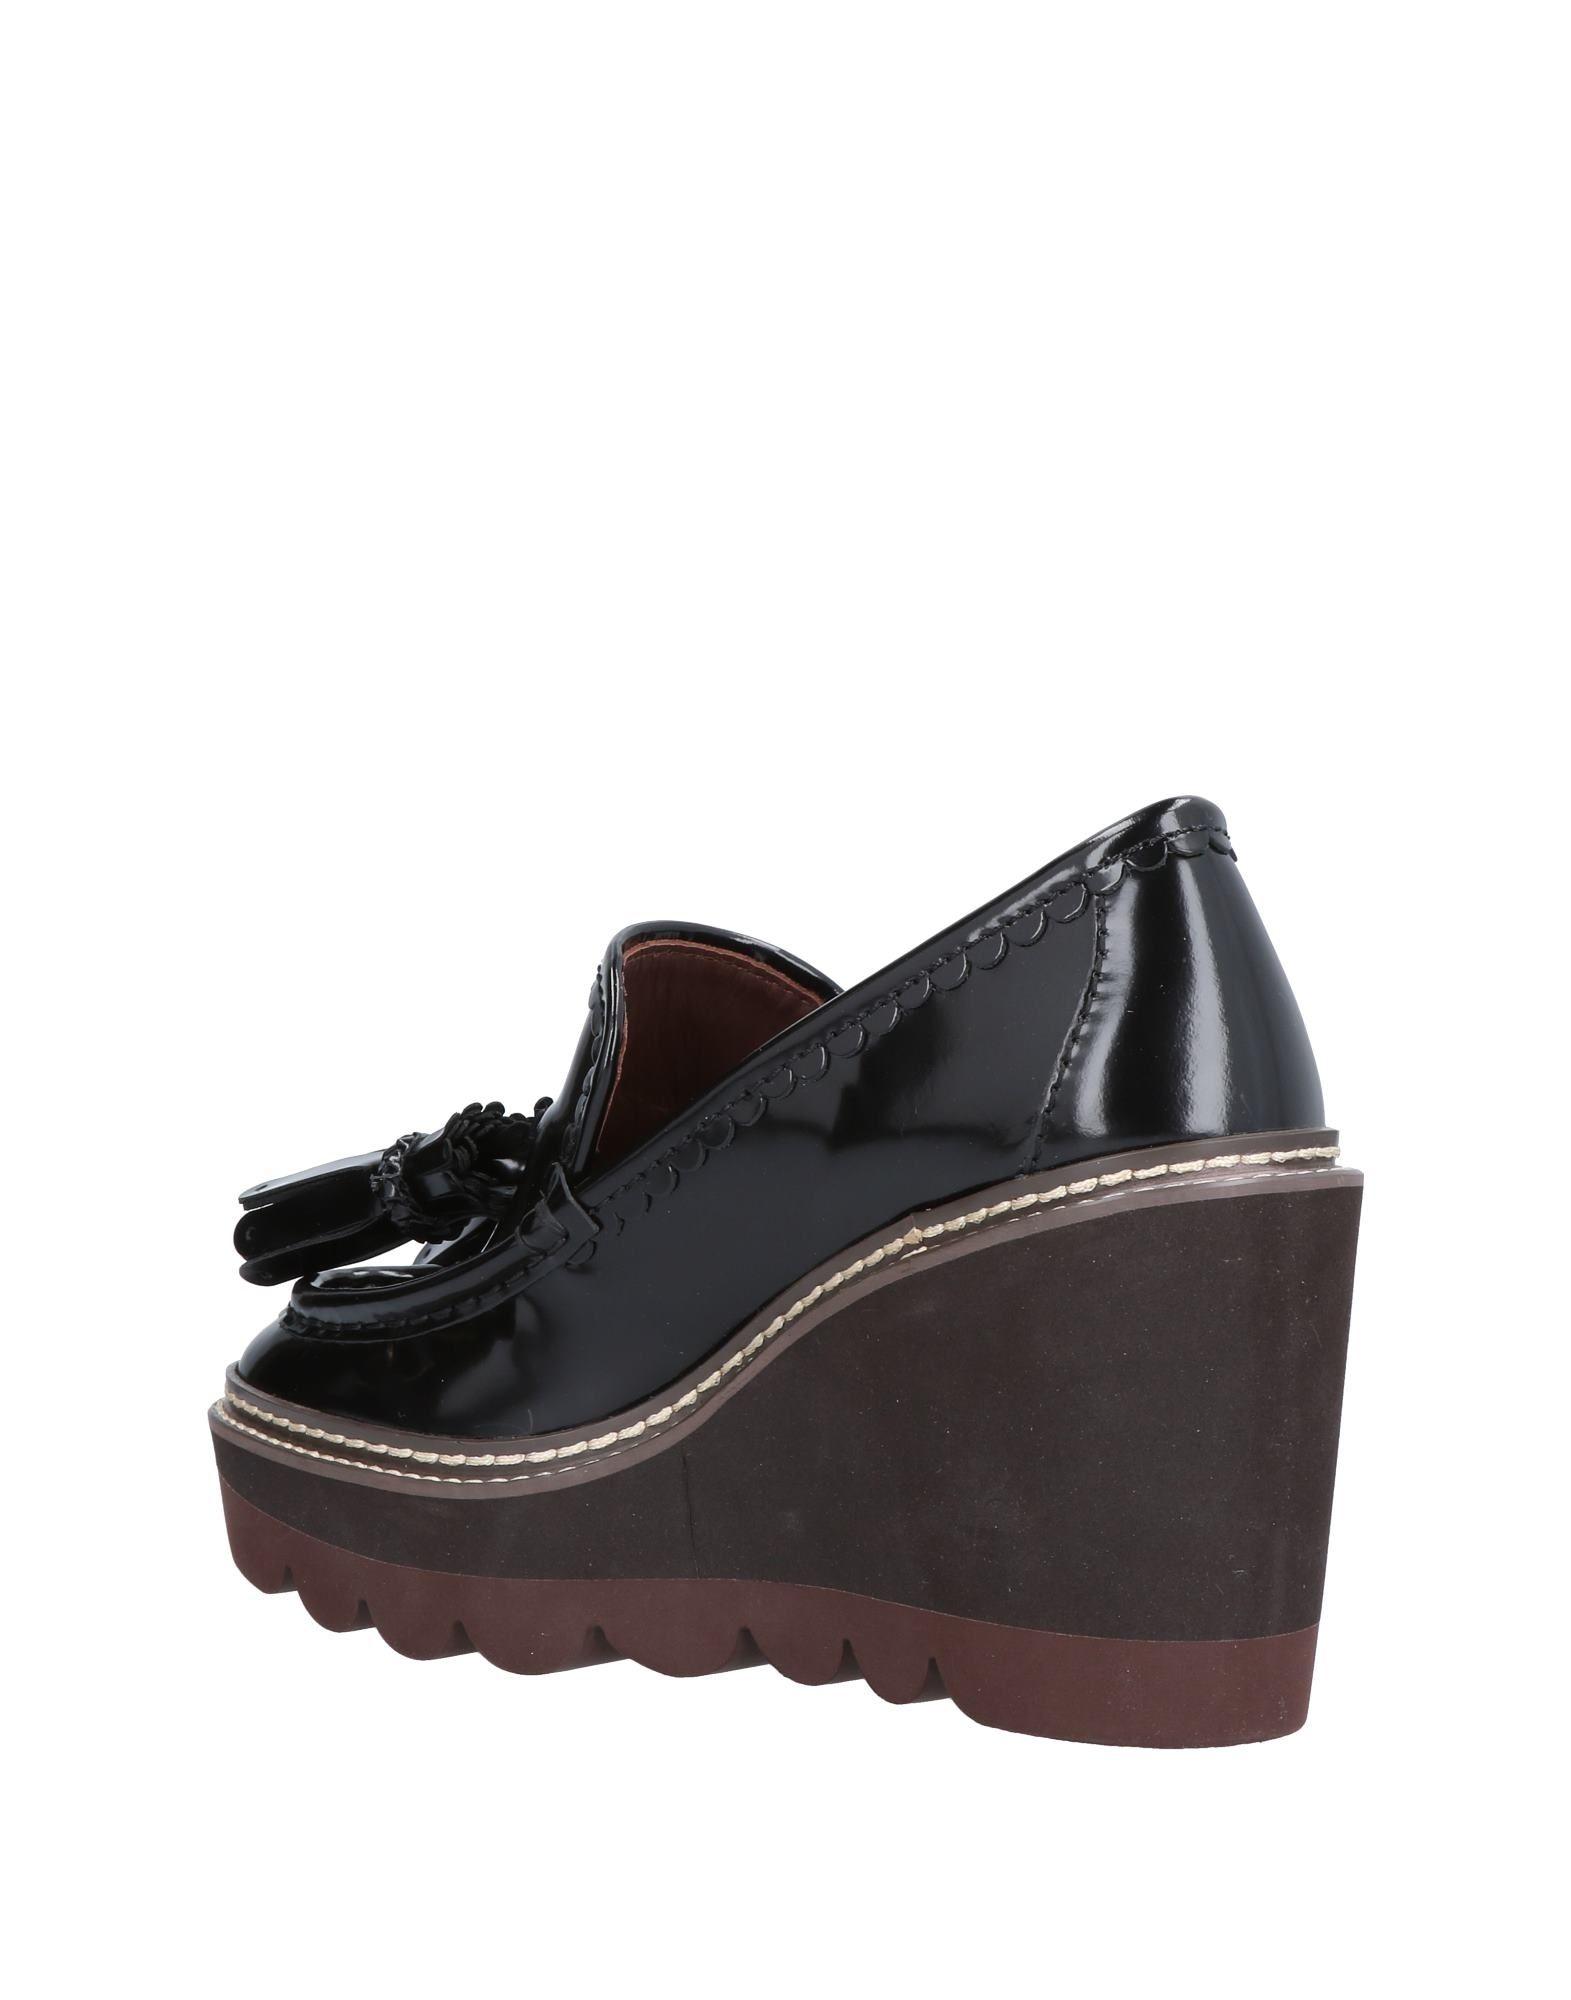 Rabatt Schuhe Mokassins See By Chloé Mokassins Schuhe Damen  11483419VB 4c6d45